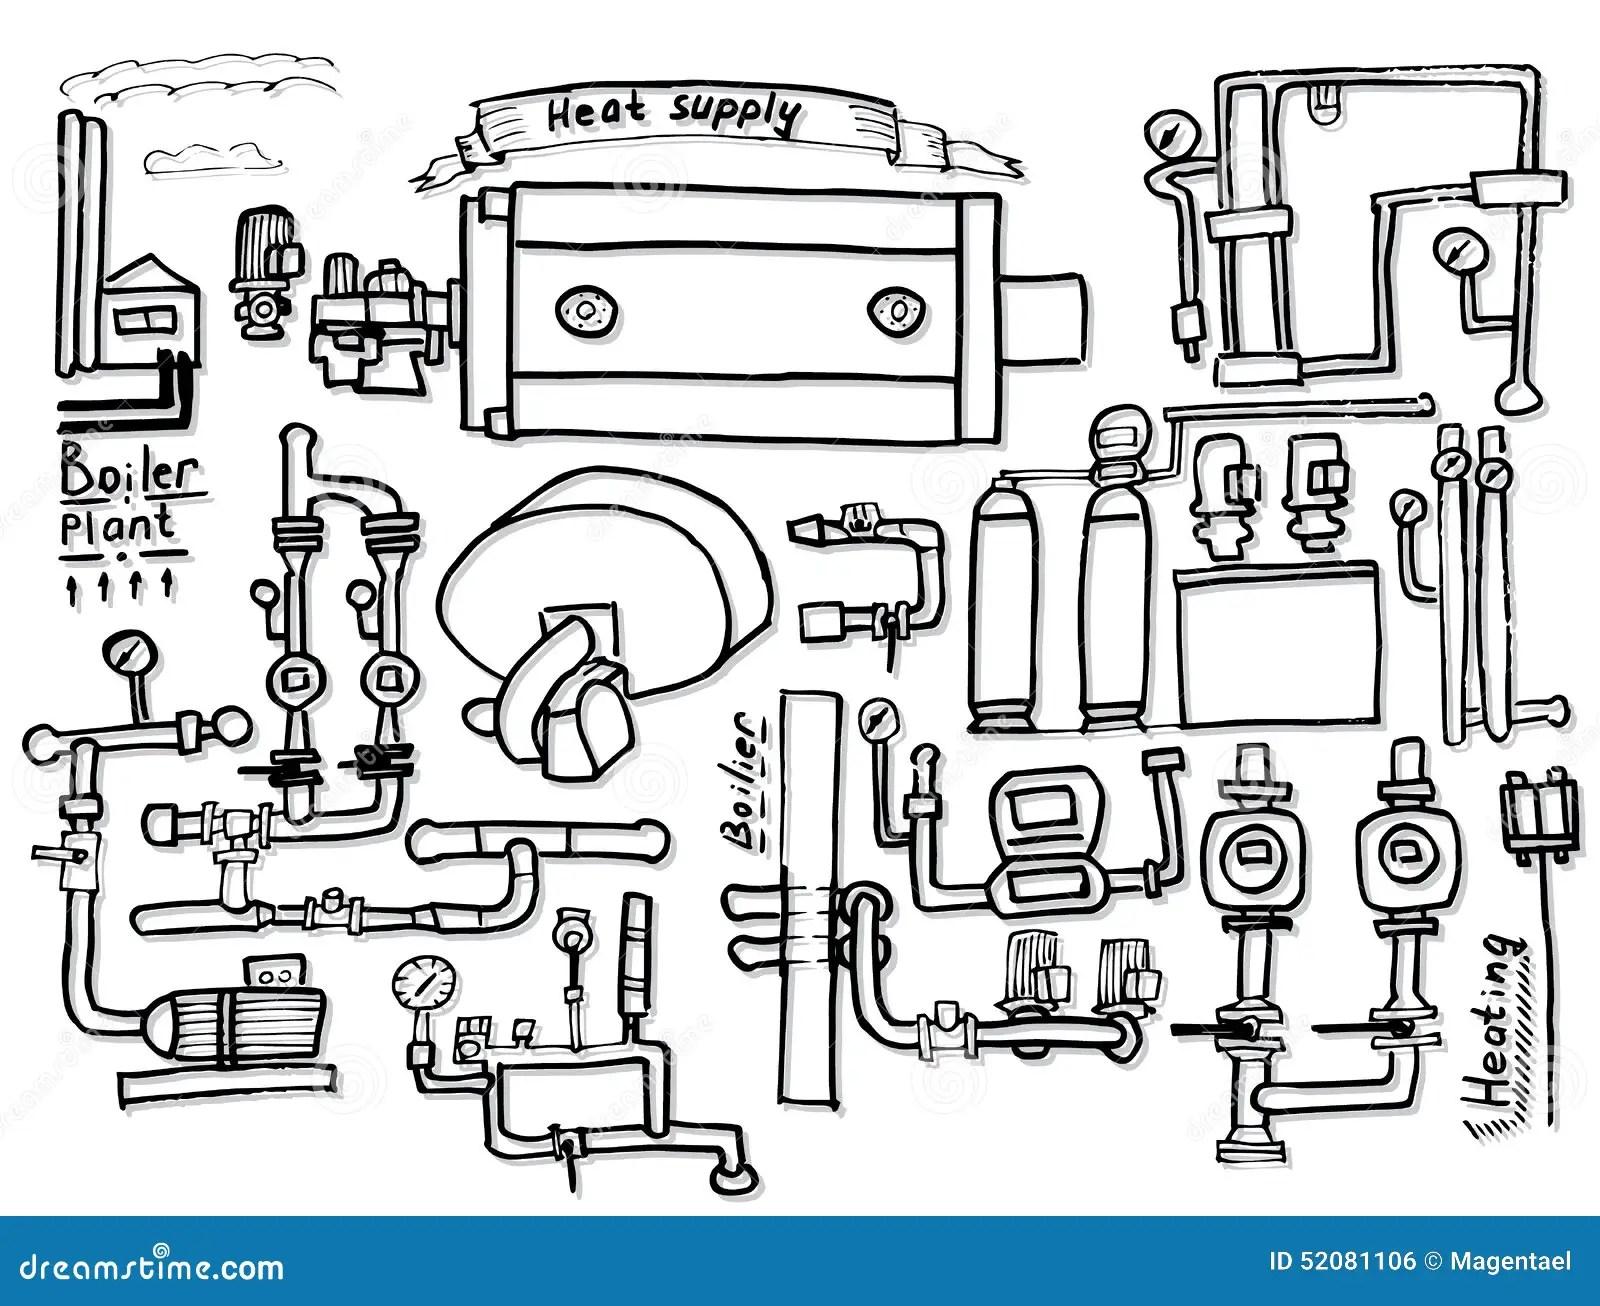 Boiler Room Equipment Engineering Systems Sketch Vector